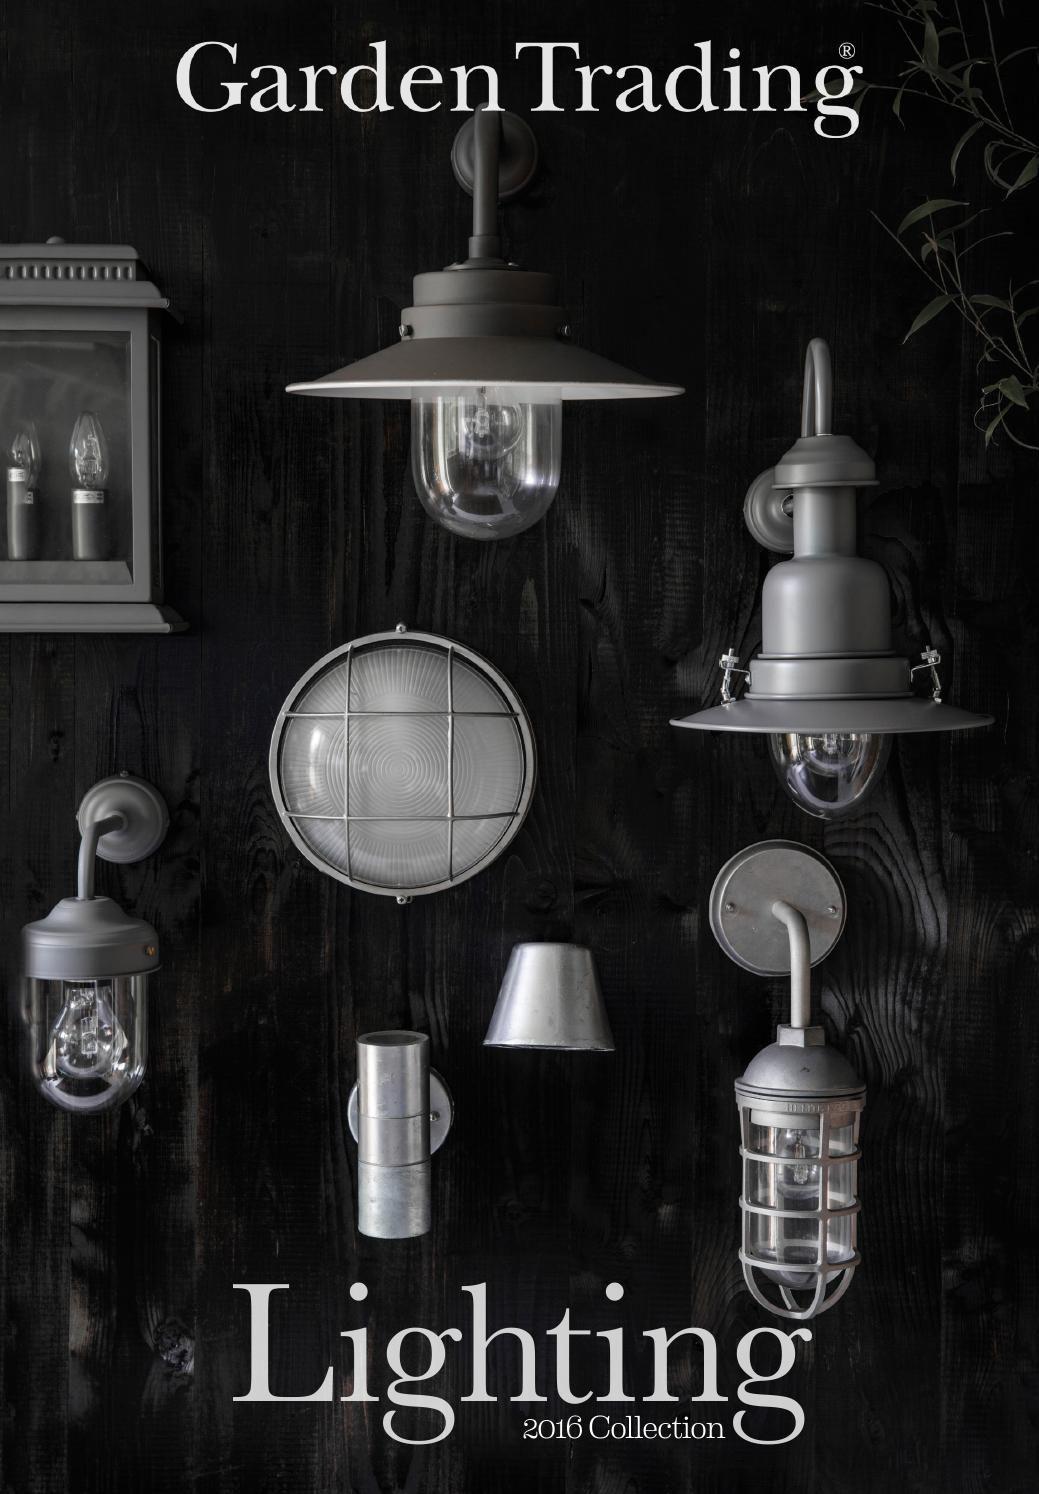 Consumer Lighting Catalogue 2016  Our Lighting range for 2016